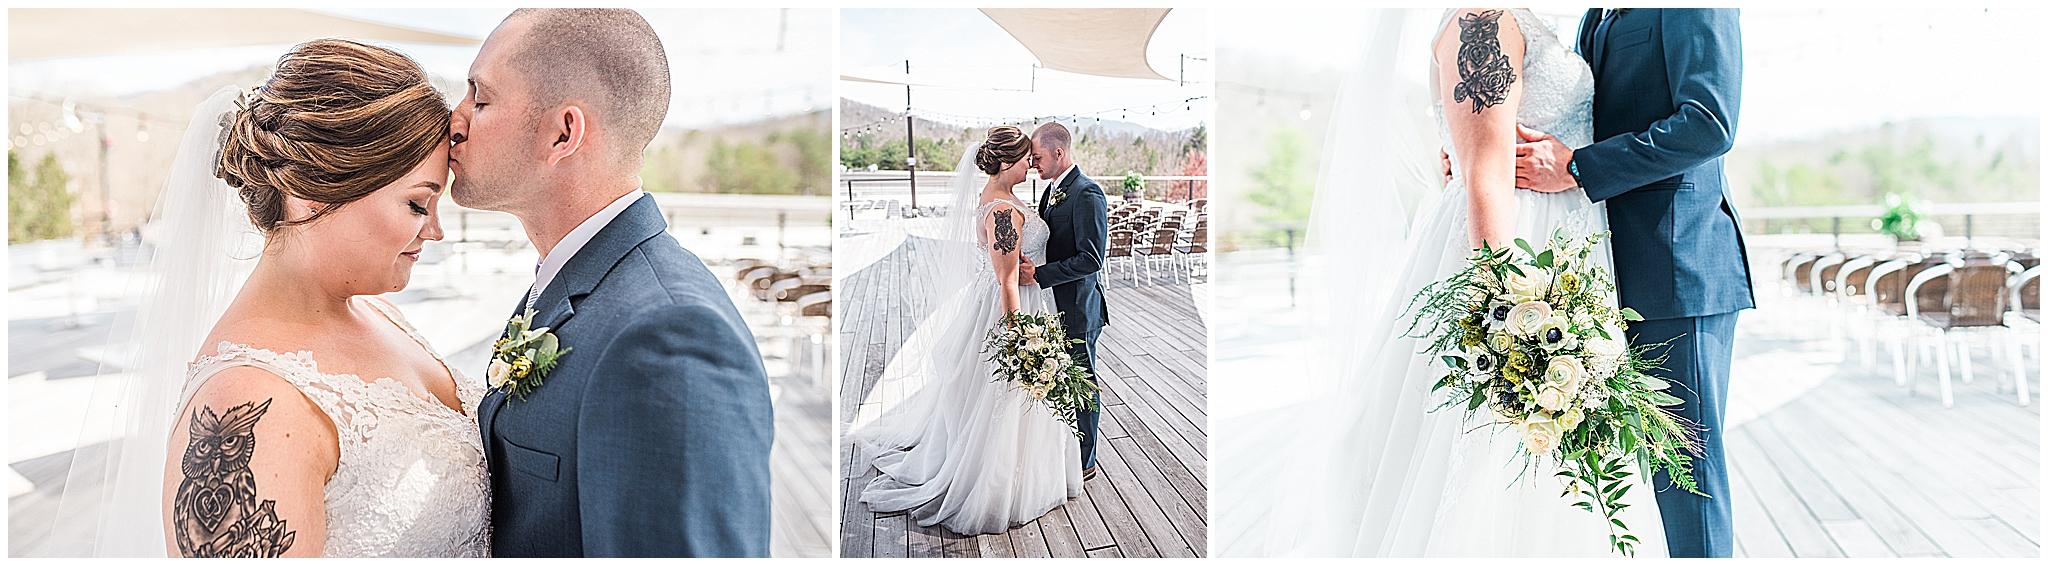 Wedding_Photographer_Asheville_Highland_Brewing_0015.jpg